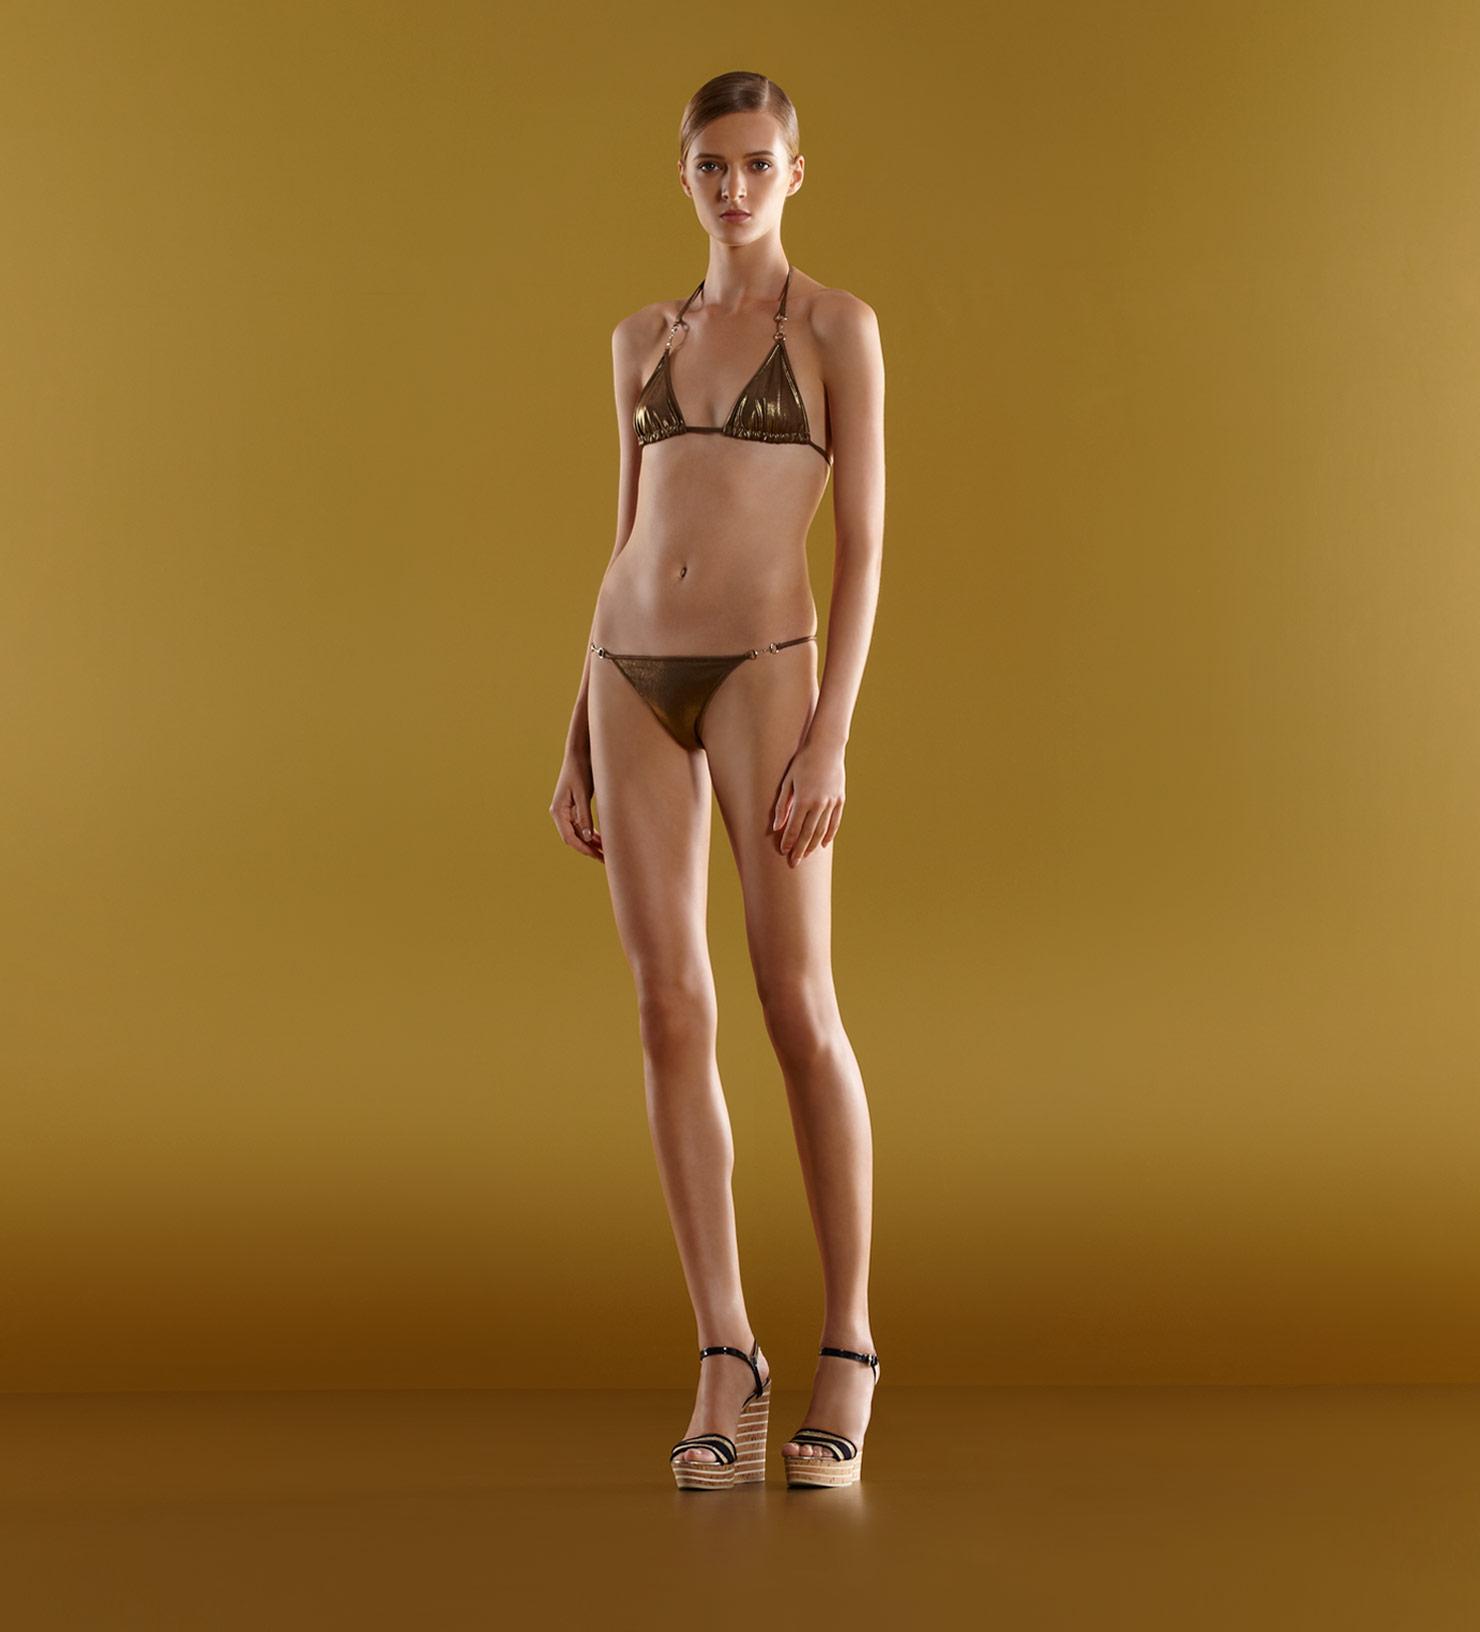 189a56f625427 Women's Metallic Triangle Top Bikini with Horsebit Detail